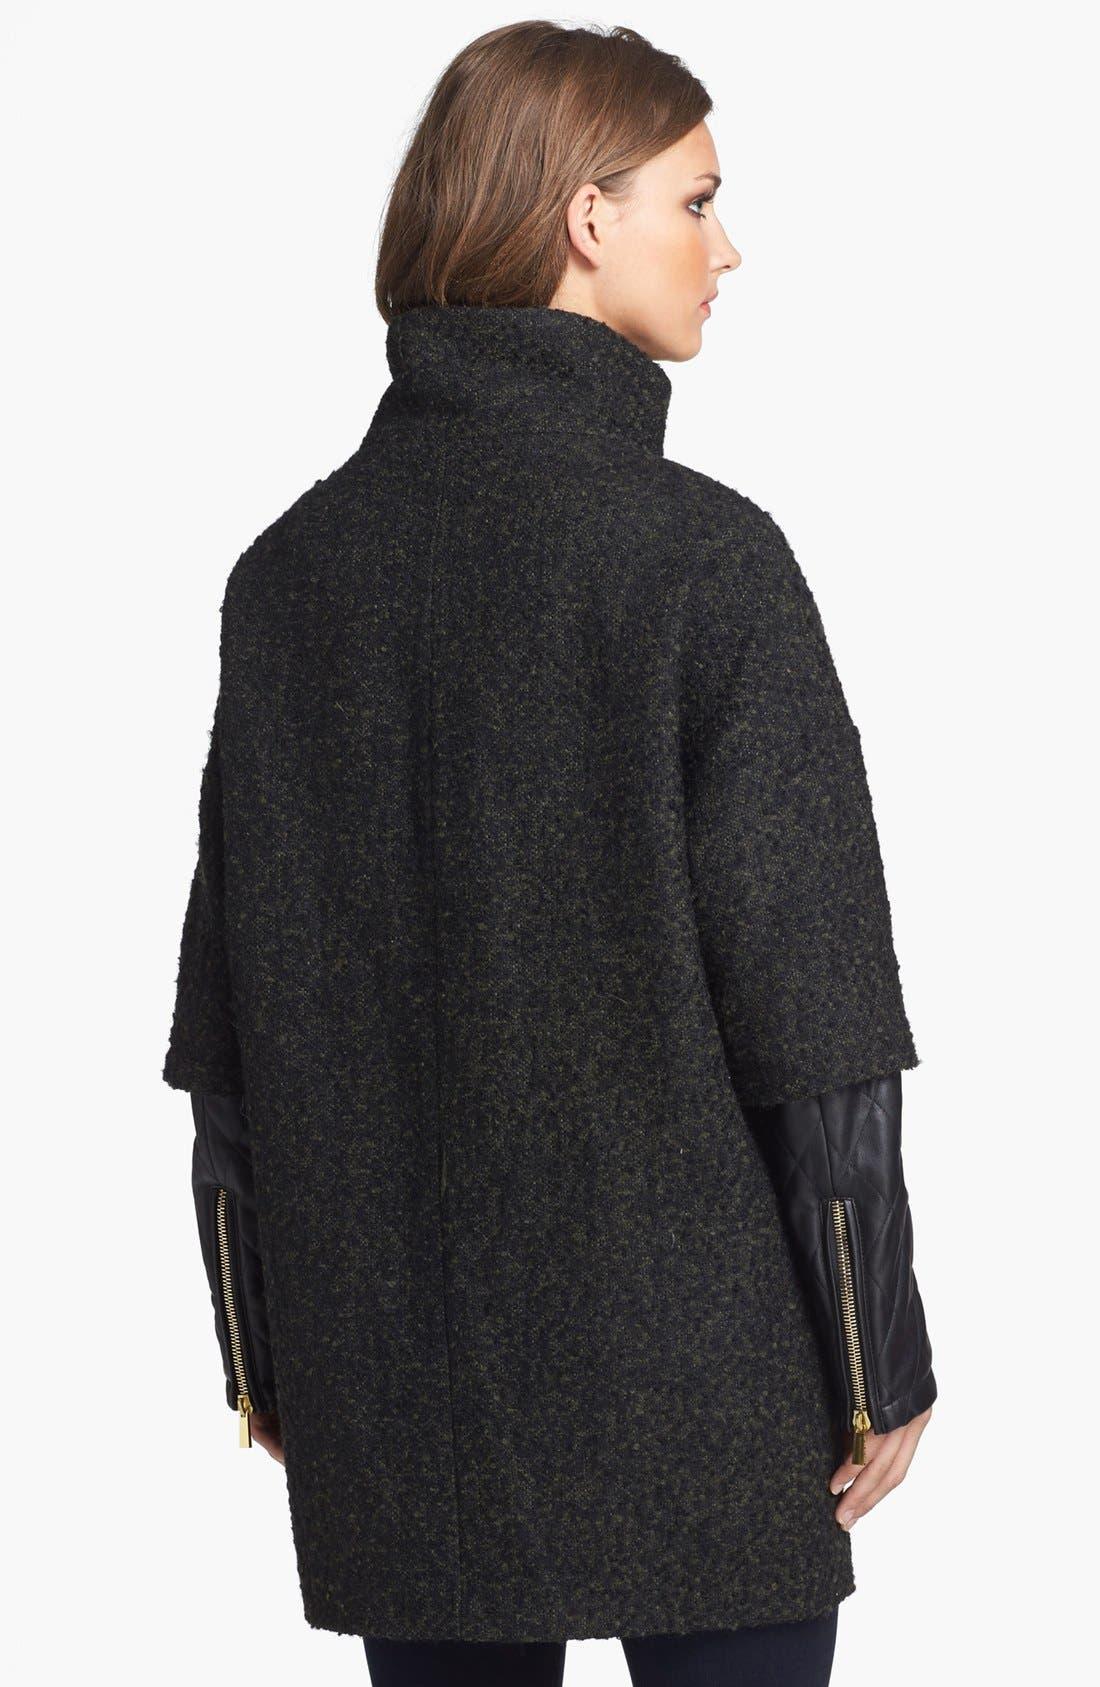 Alternate Image 2  - Vince Camuto Faux Leather Sleeve Bouclé Tweed Coat